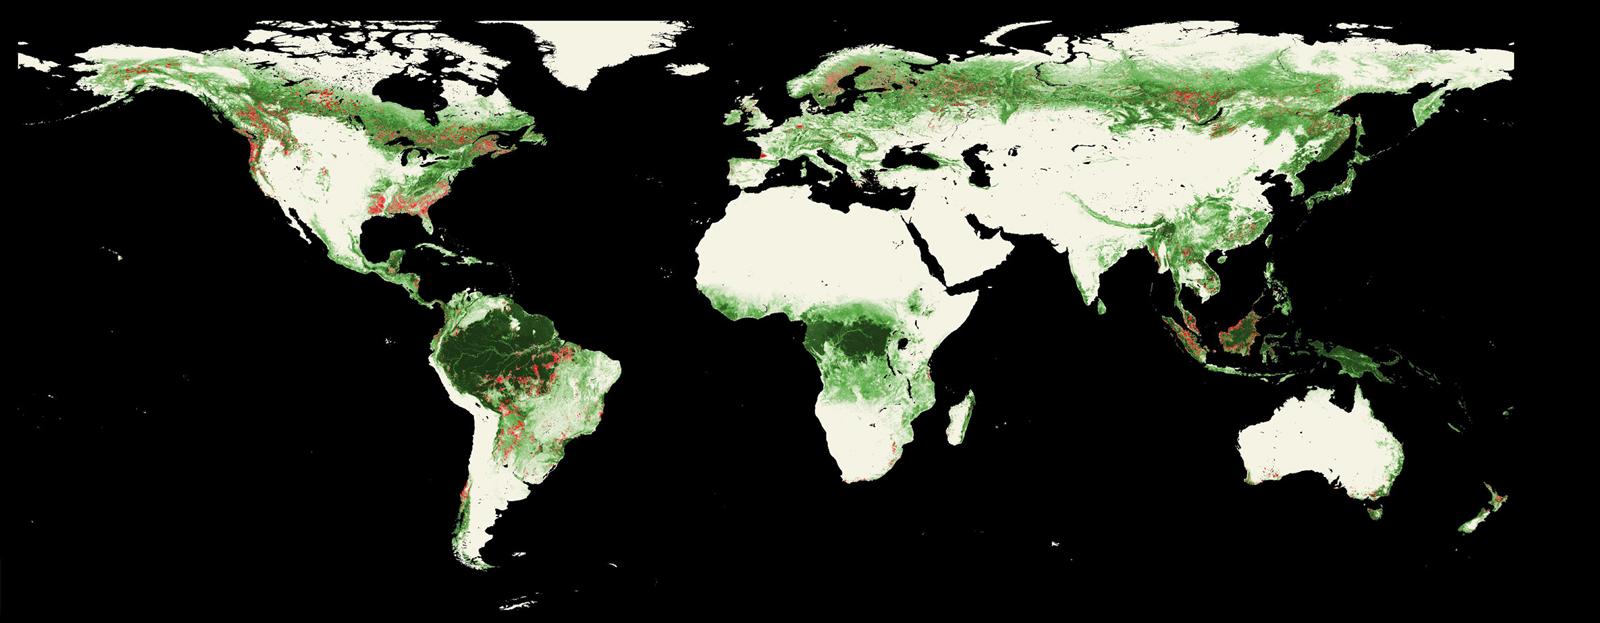 International Deforestation Patterns in Tropical Rainforests